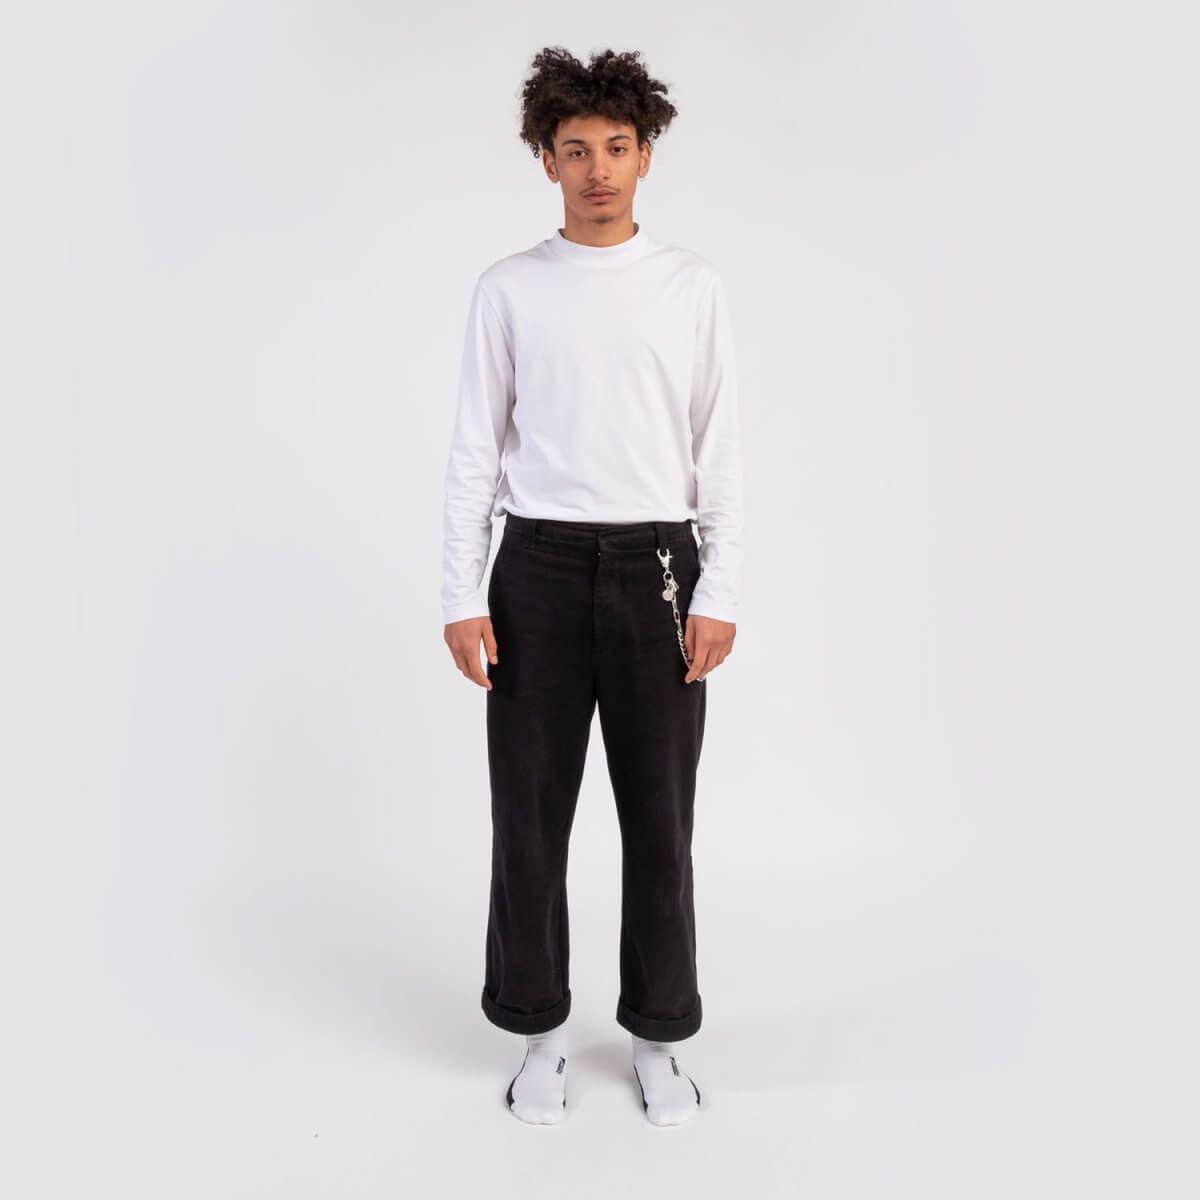 catena-pantalone-argento-fabbrica-supplies